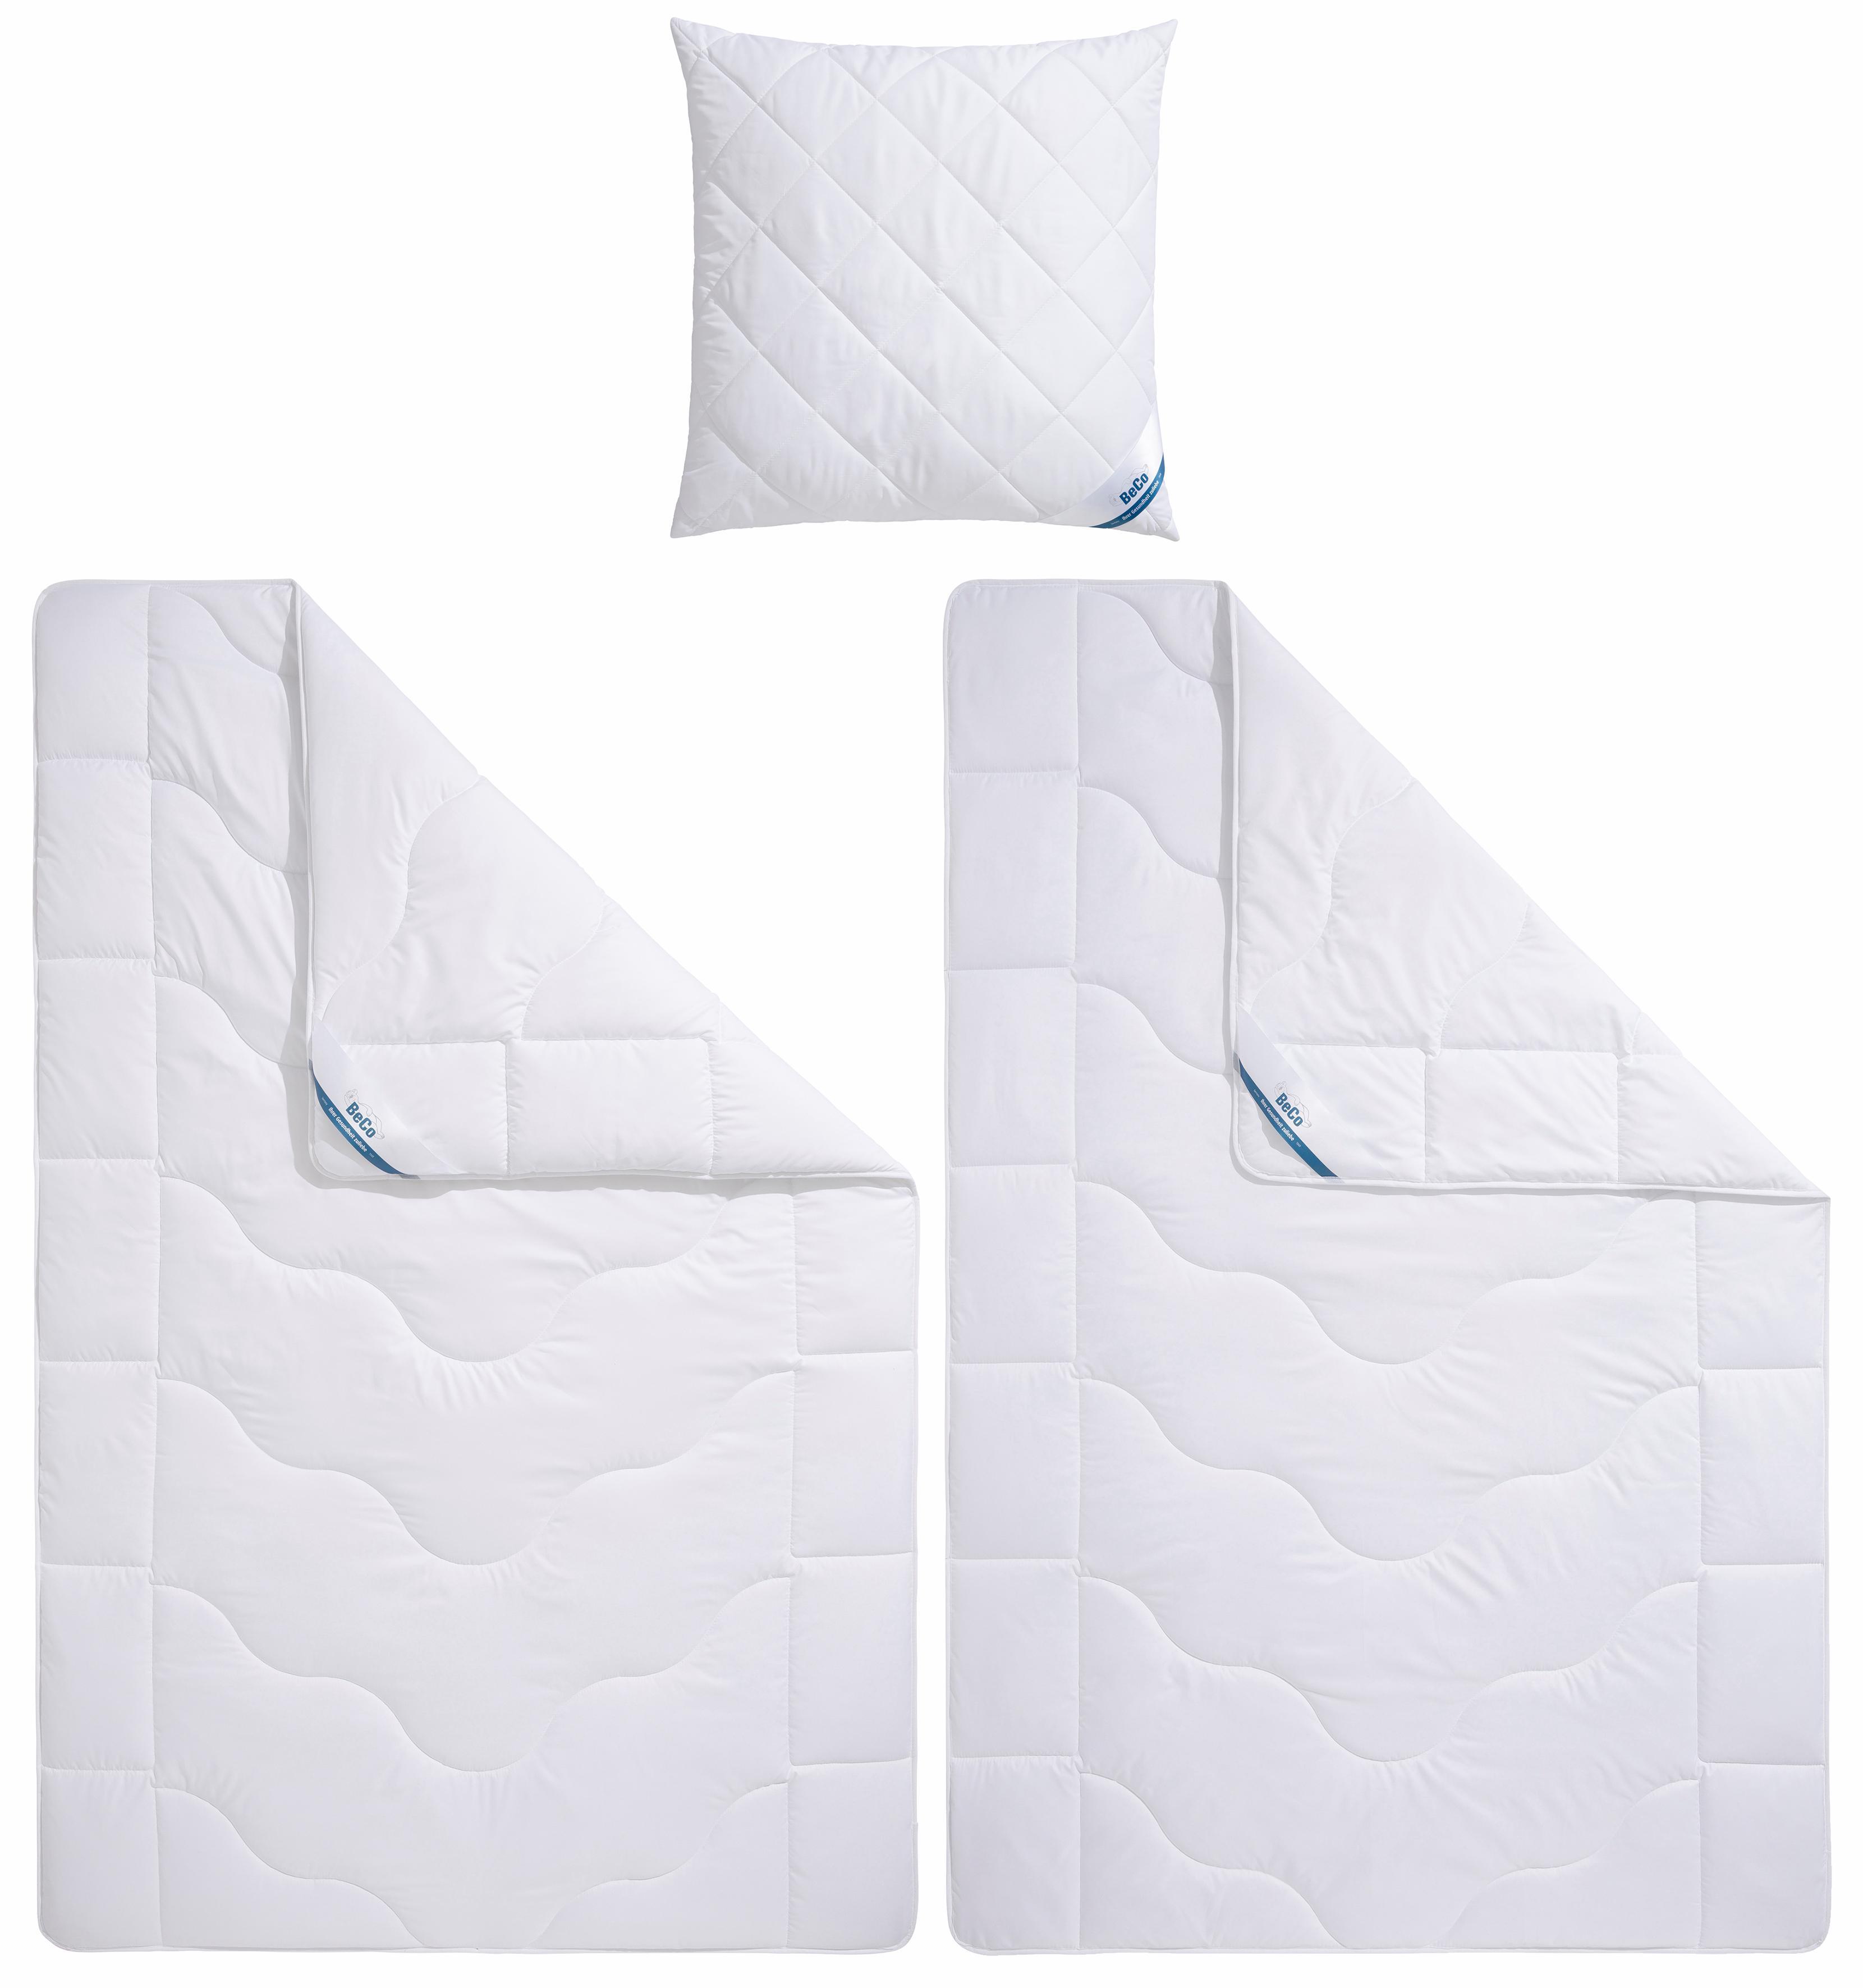 Bettdecken + Kopfkissen Cool & Thermo Beco warm